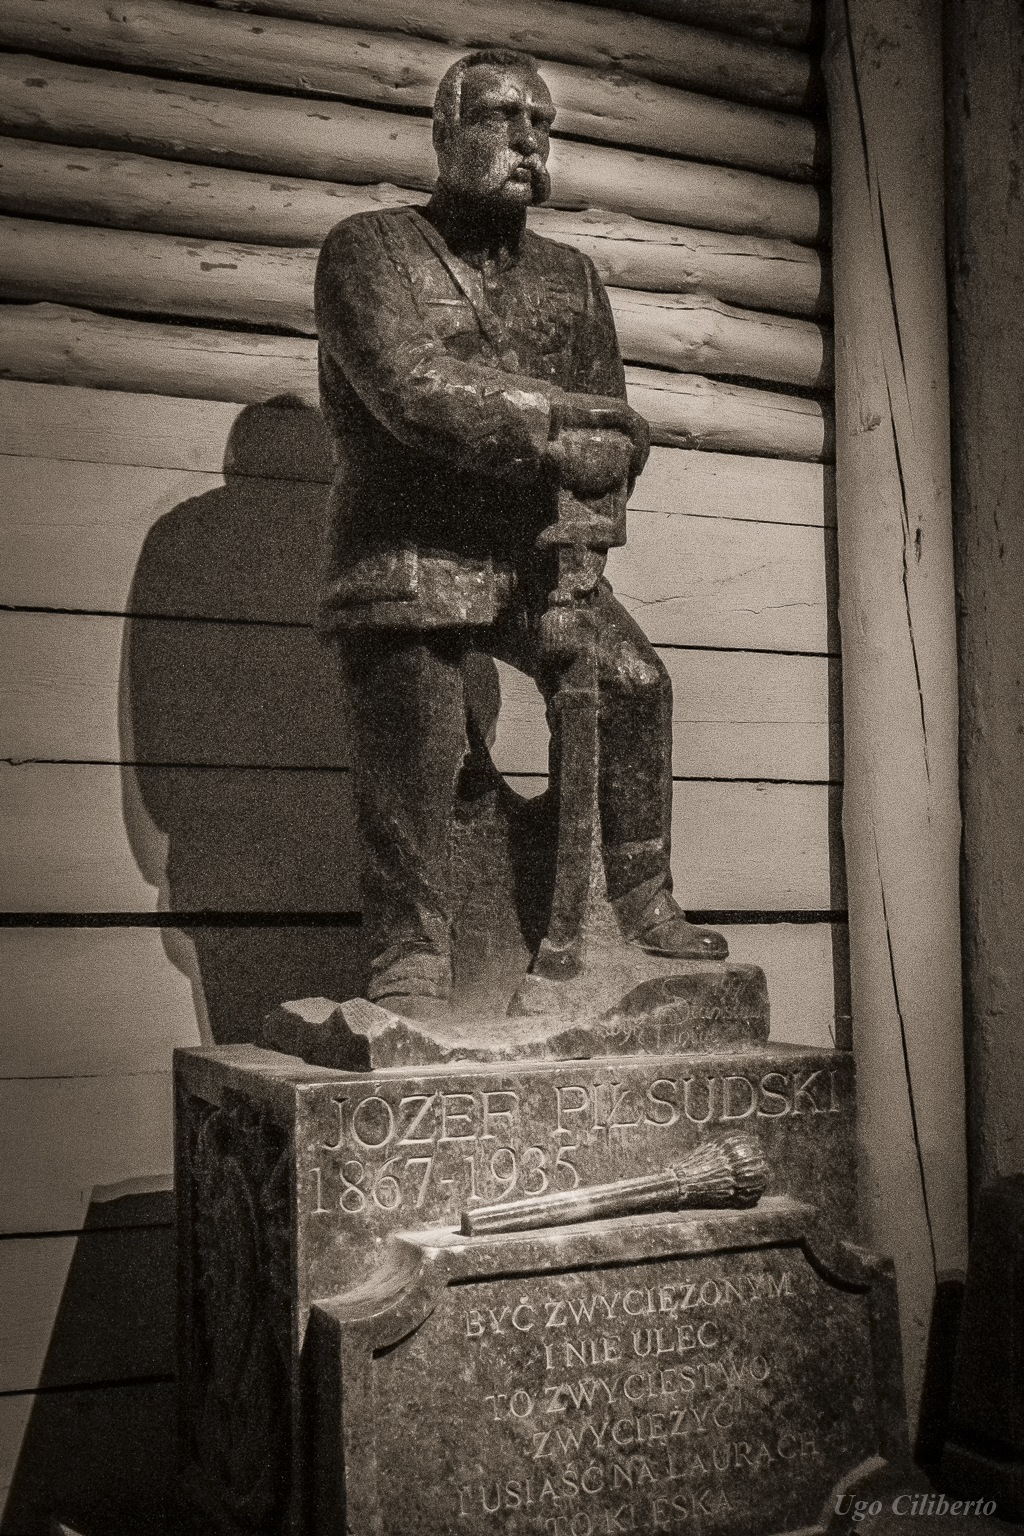 Cracovia - Miniere di Sale, statua del generale Jozef Pilsudski by ugo